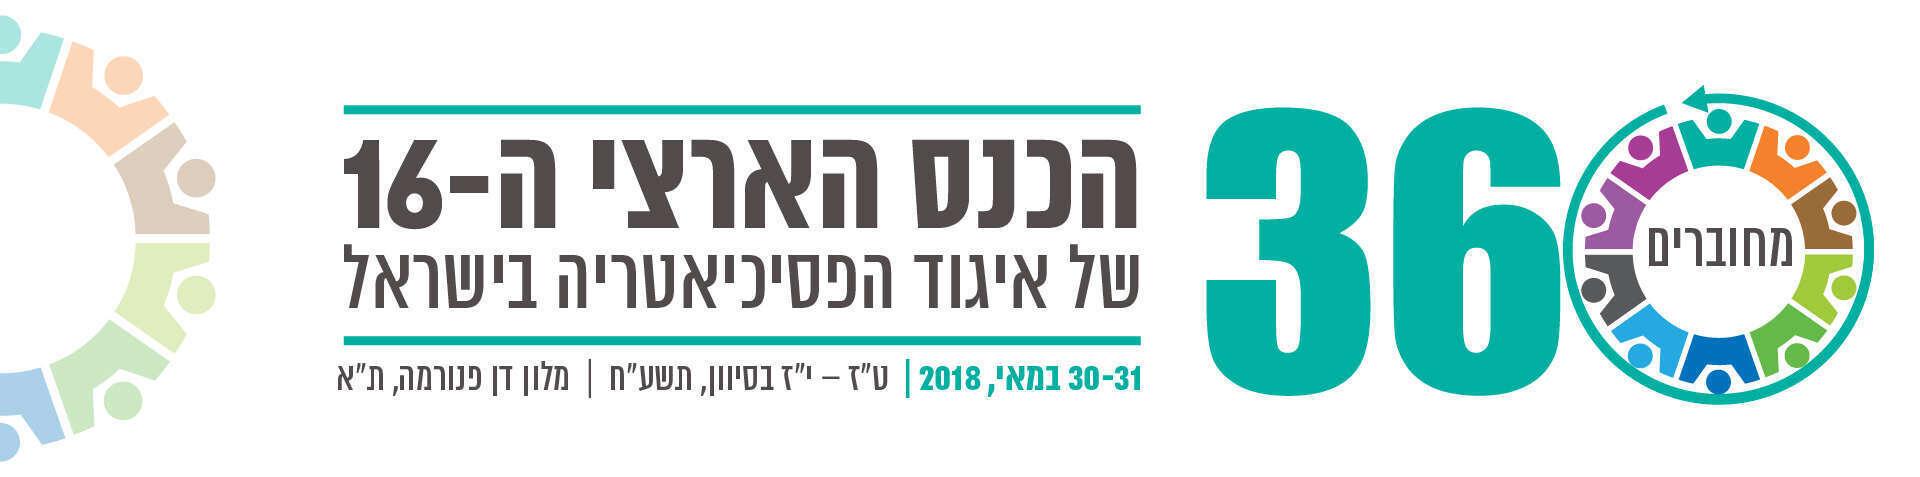 כנס איגוד הפסיכיאטריה בישראל 2018